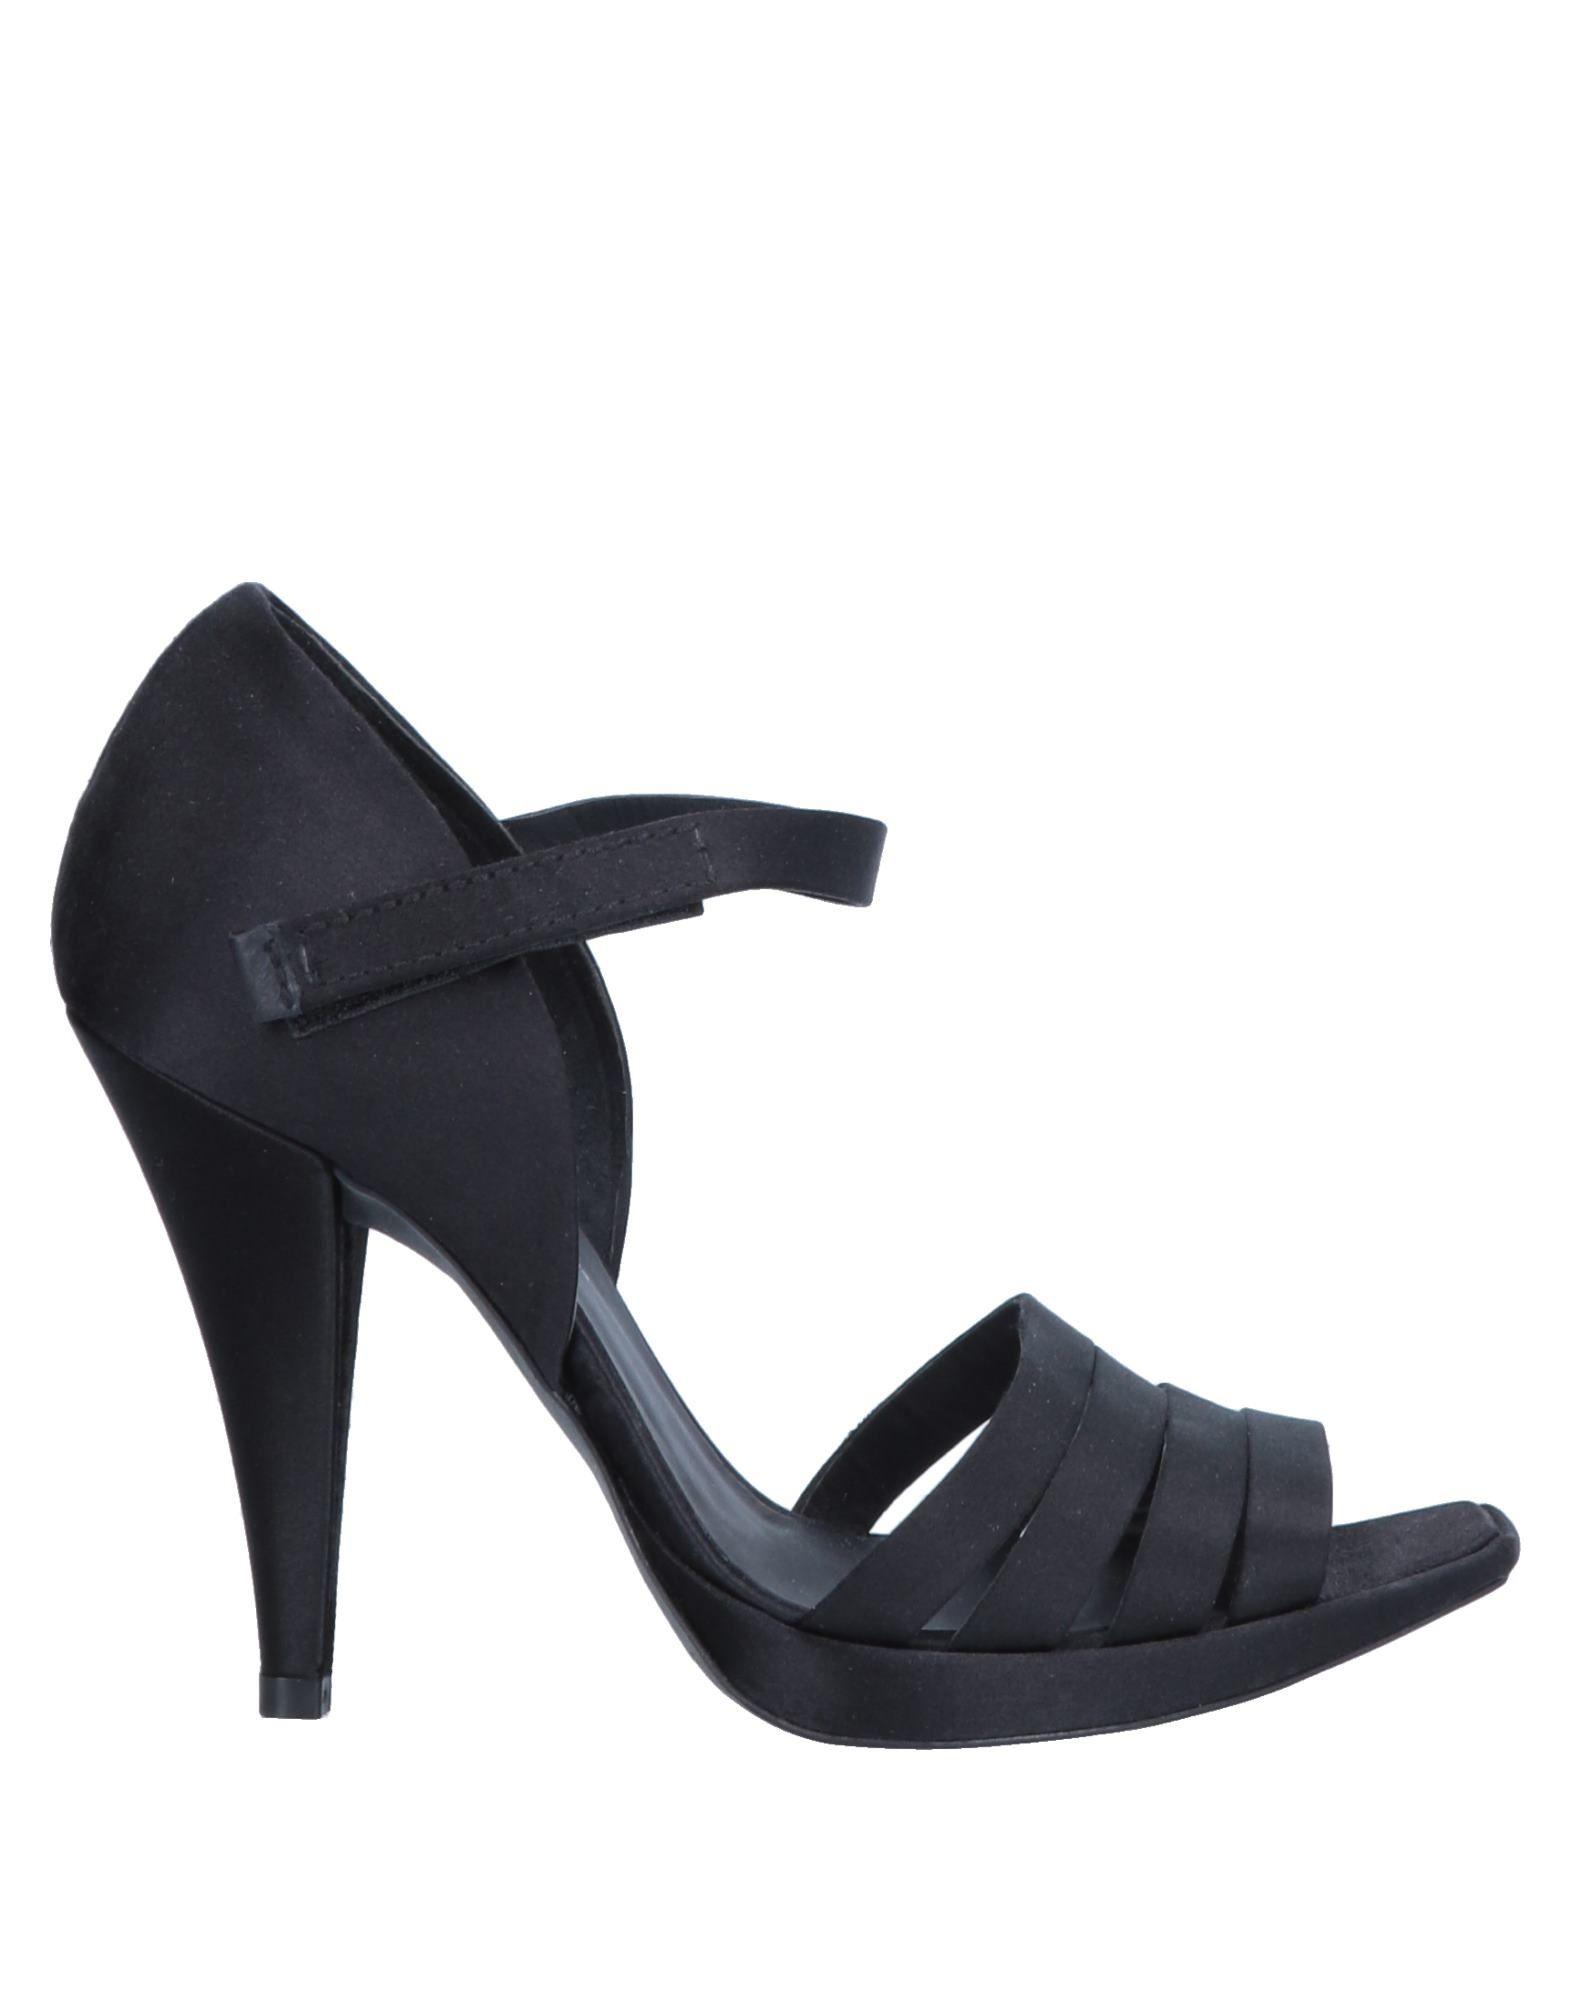 Stringate Barleycorn offerte Donna - 11481191PE Nuove offerte Barleycorn e scarpe comode b09a90